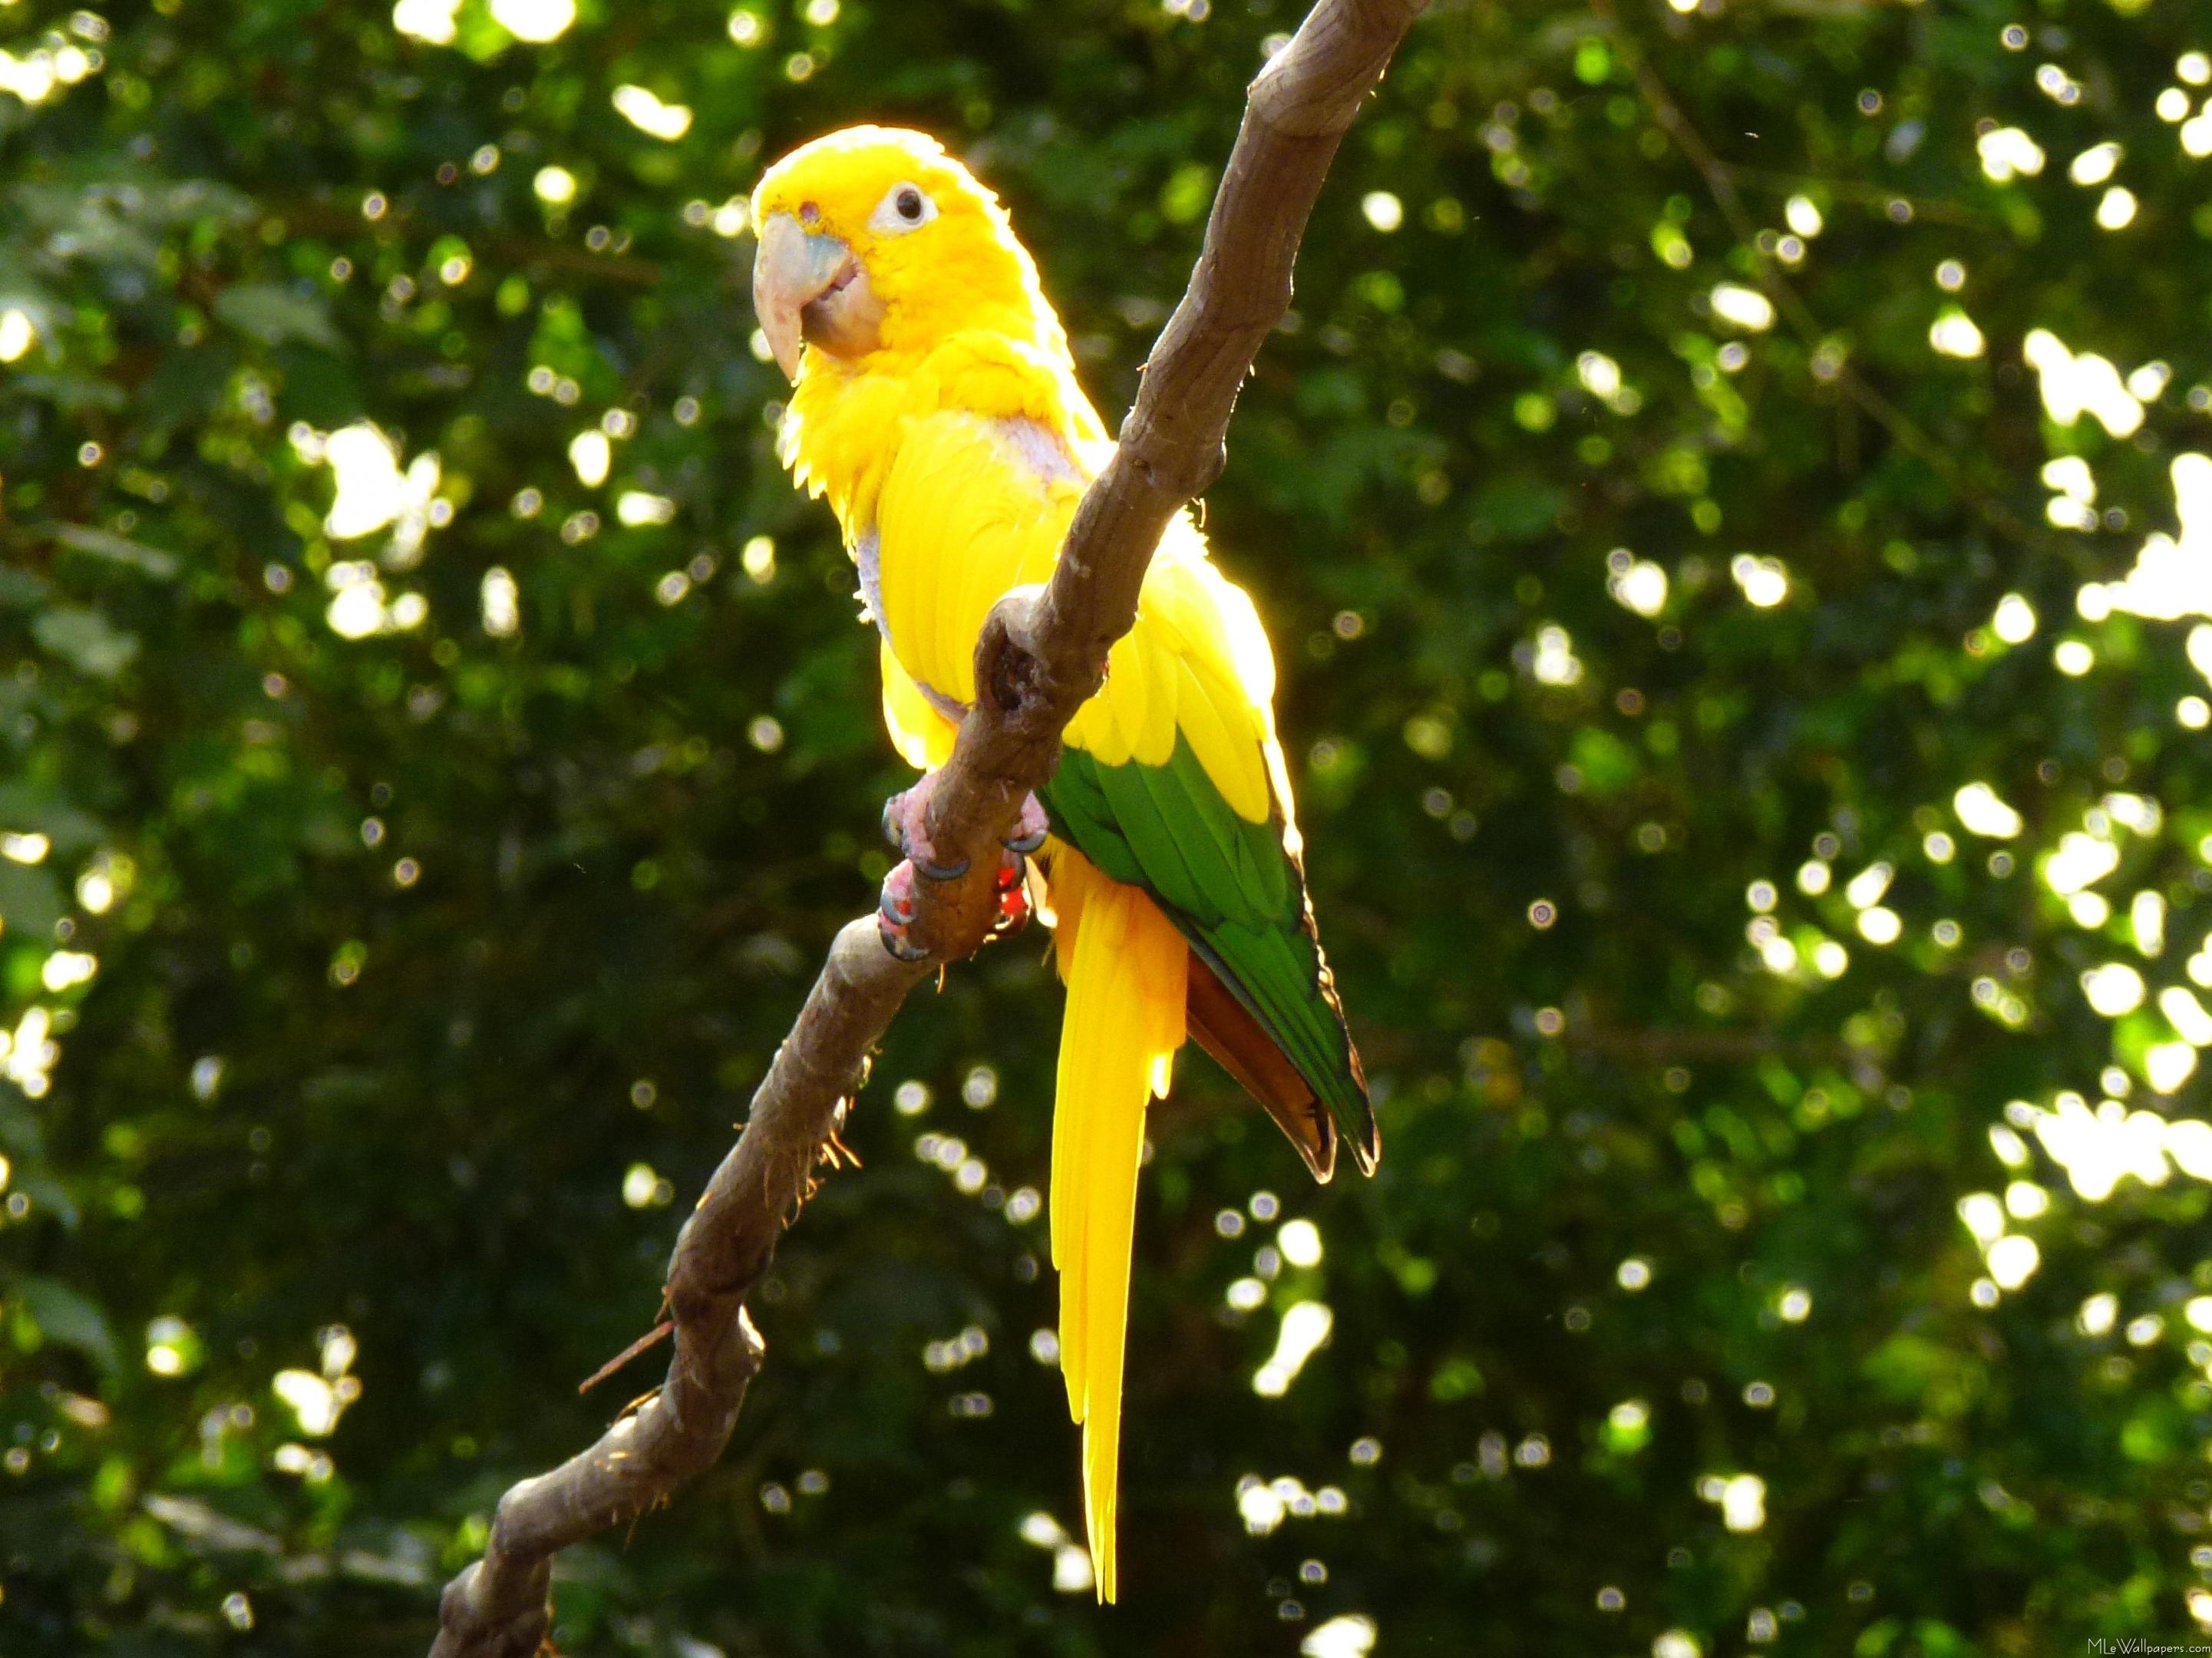 MLeWallpapers com - Yellow Parrot